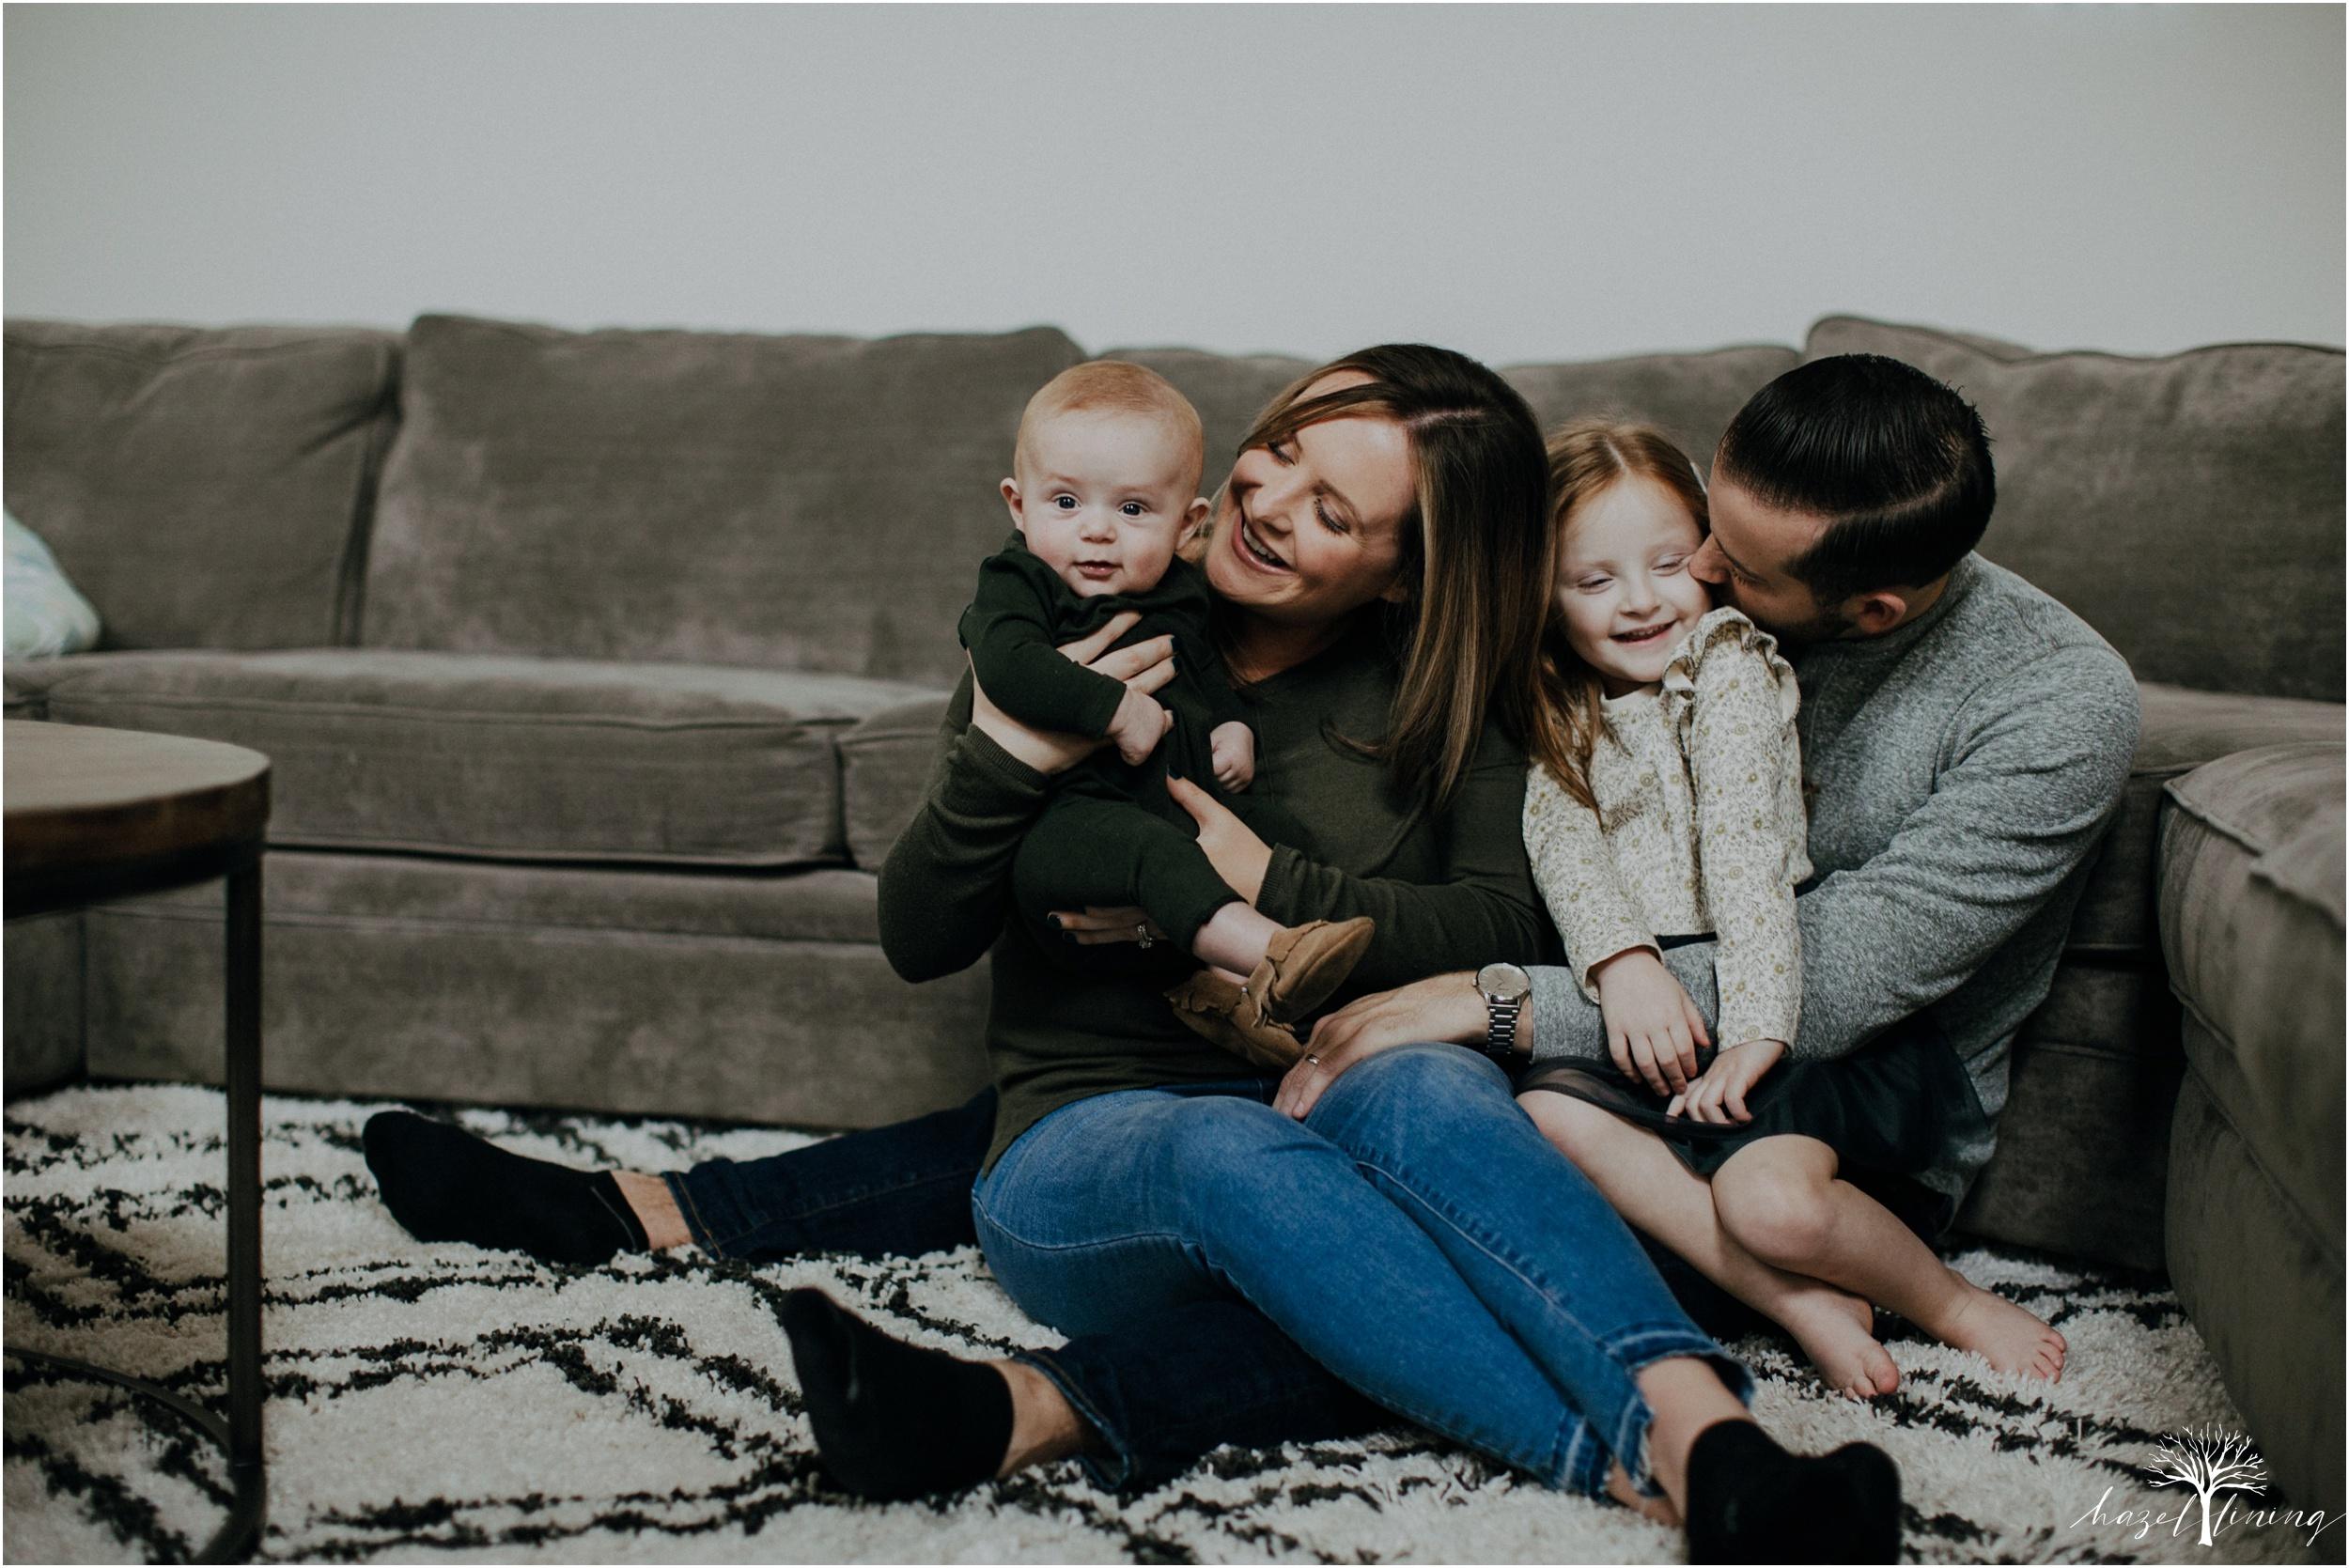 pellgrino-family-in-home-lifestyle-family-portraits_0048.jpg